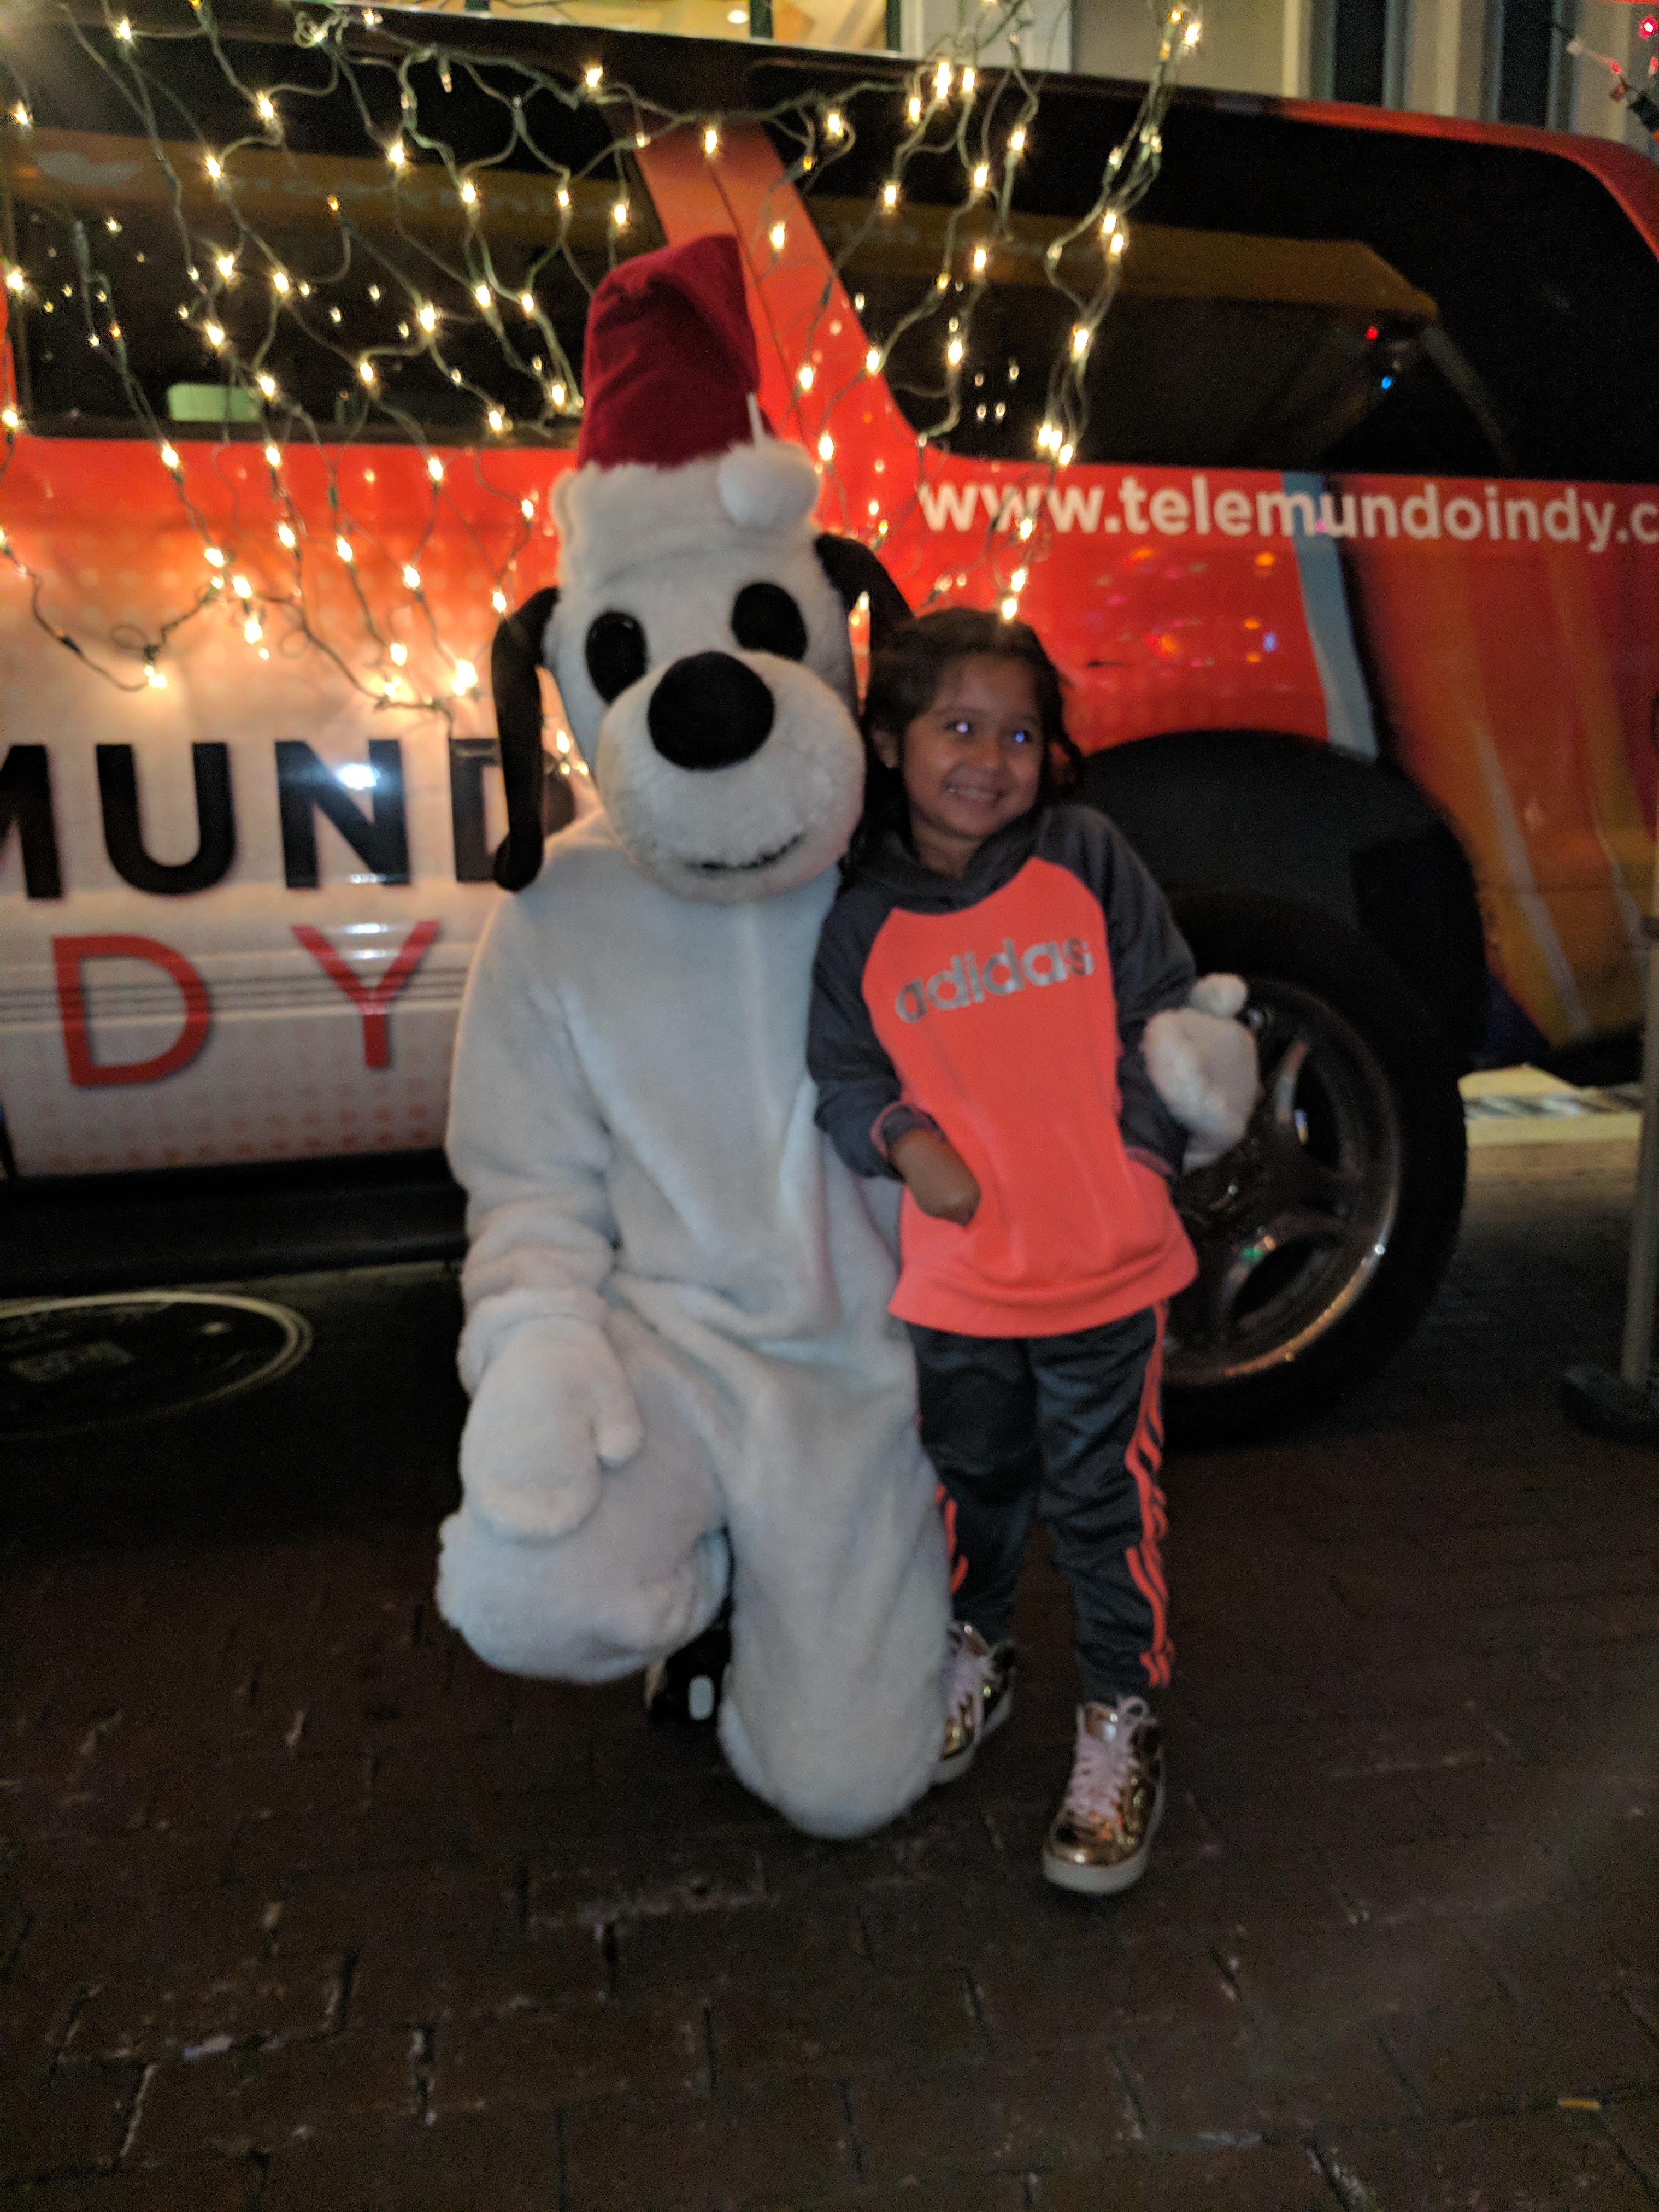 Circle of Lights 2017 - Telemundo Indy